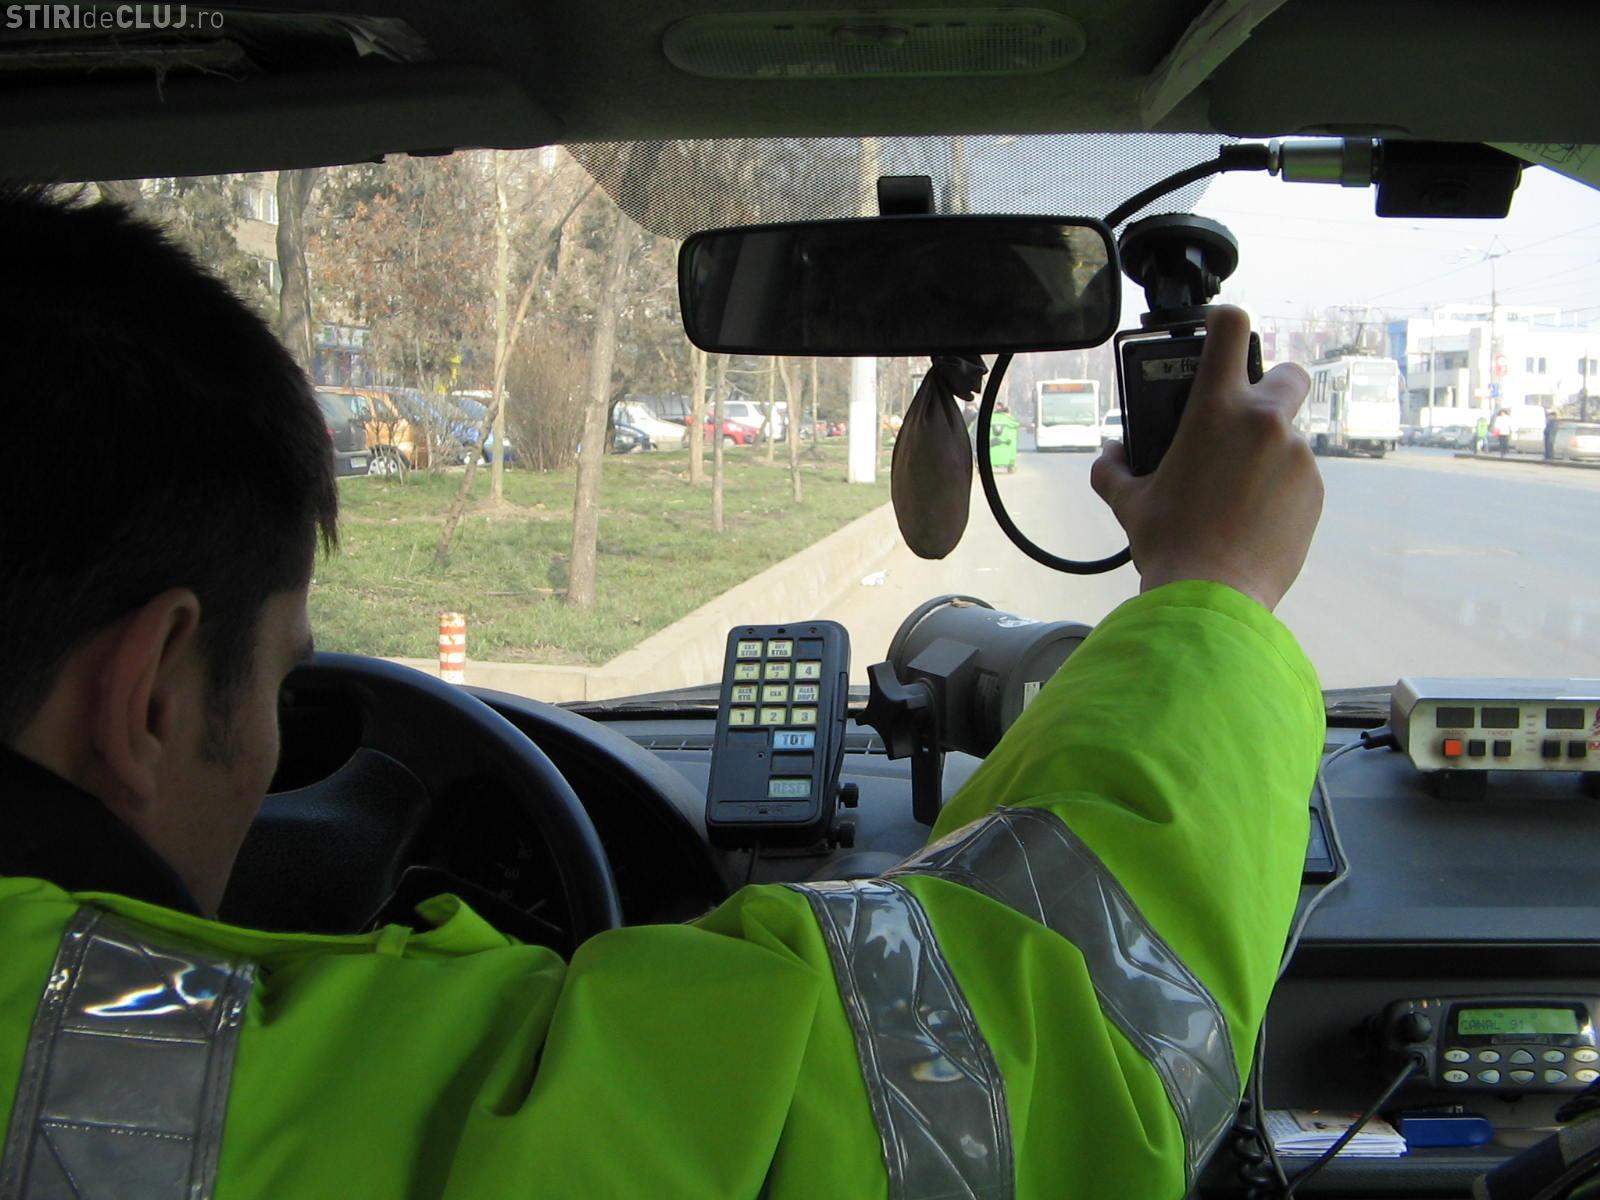 Vezi pe ce drumuri din Cluj sunt amplasate radare sambata, duminica si luni!